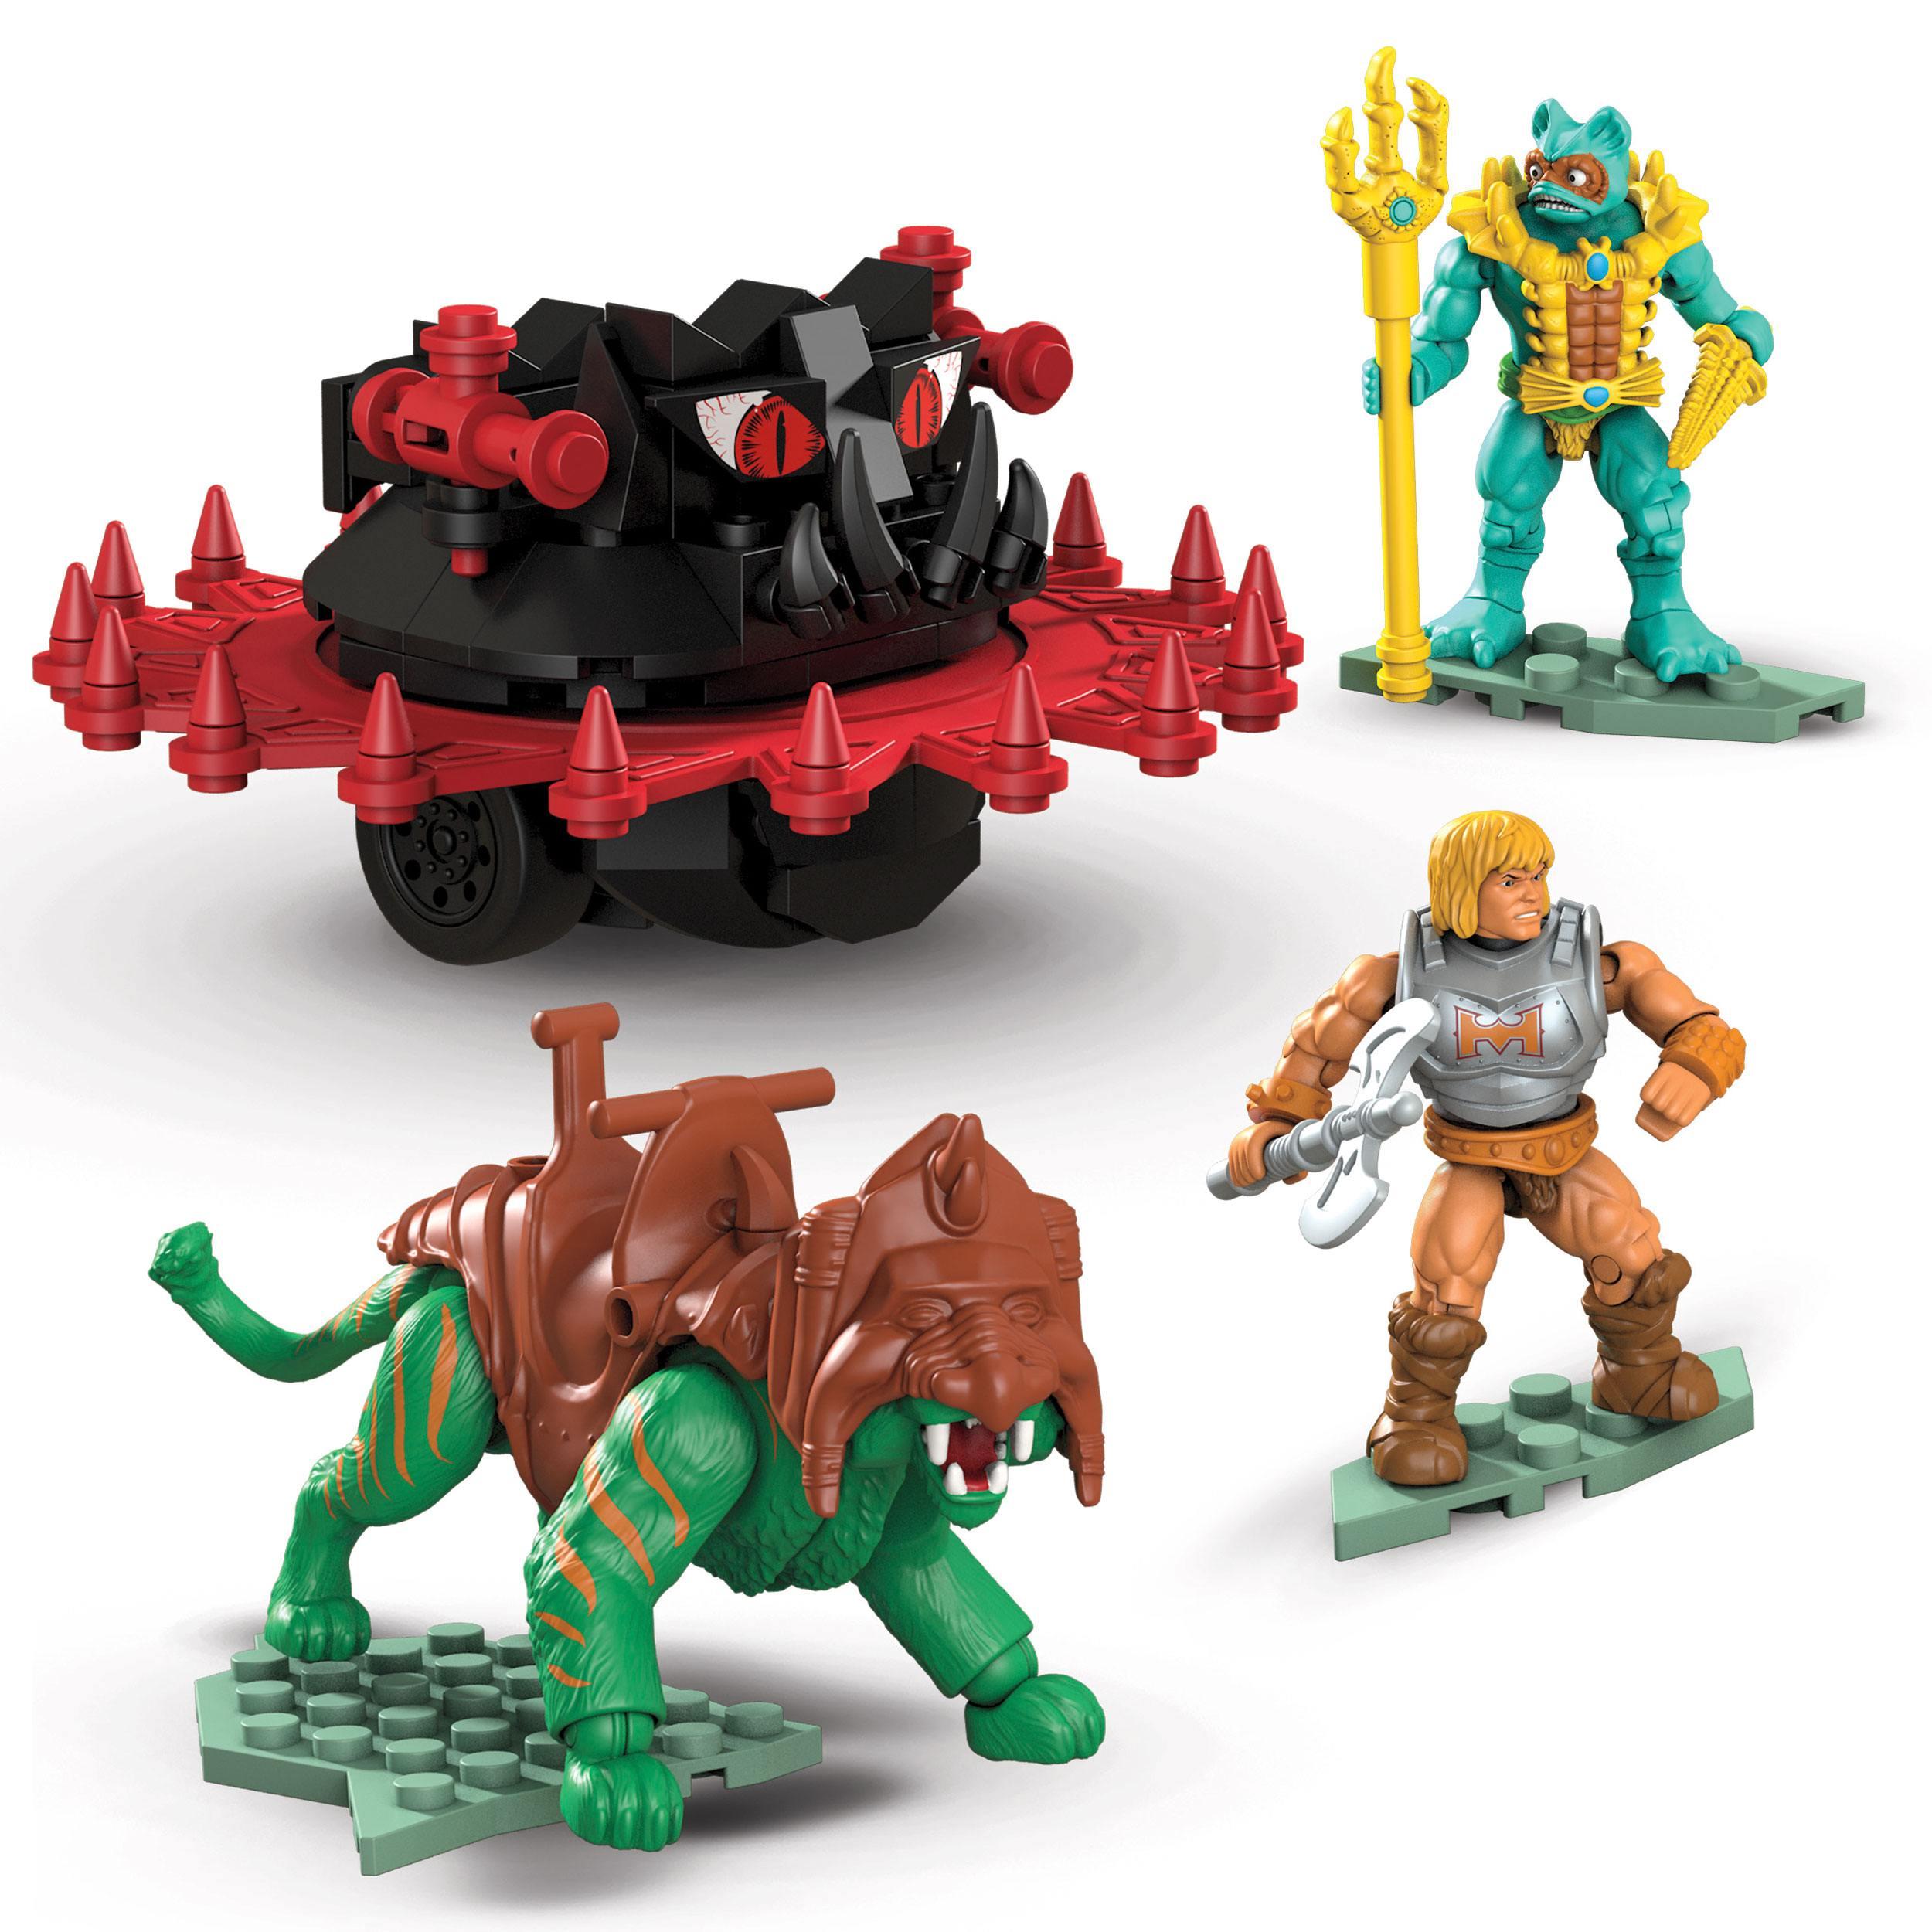 Masters of the Universe Mega Construx Probuilders Bauset Battle Cat vs. Roton MATTGPH23 887961886986